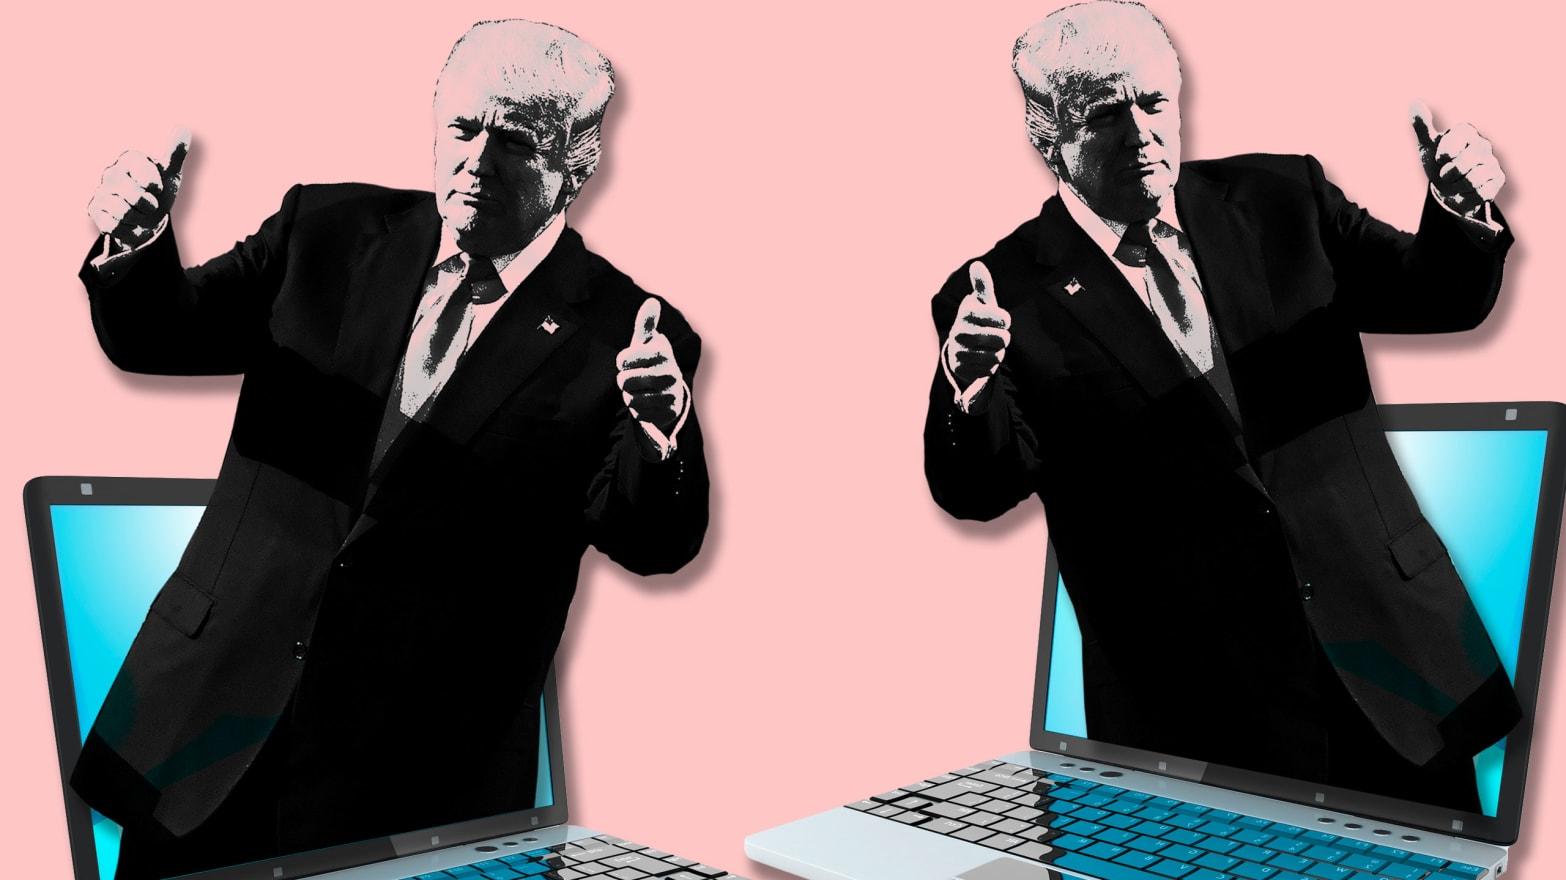 How Pro-Trump Twitter Bots Spread Fake News